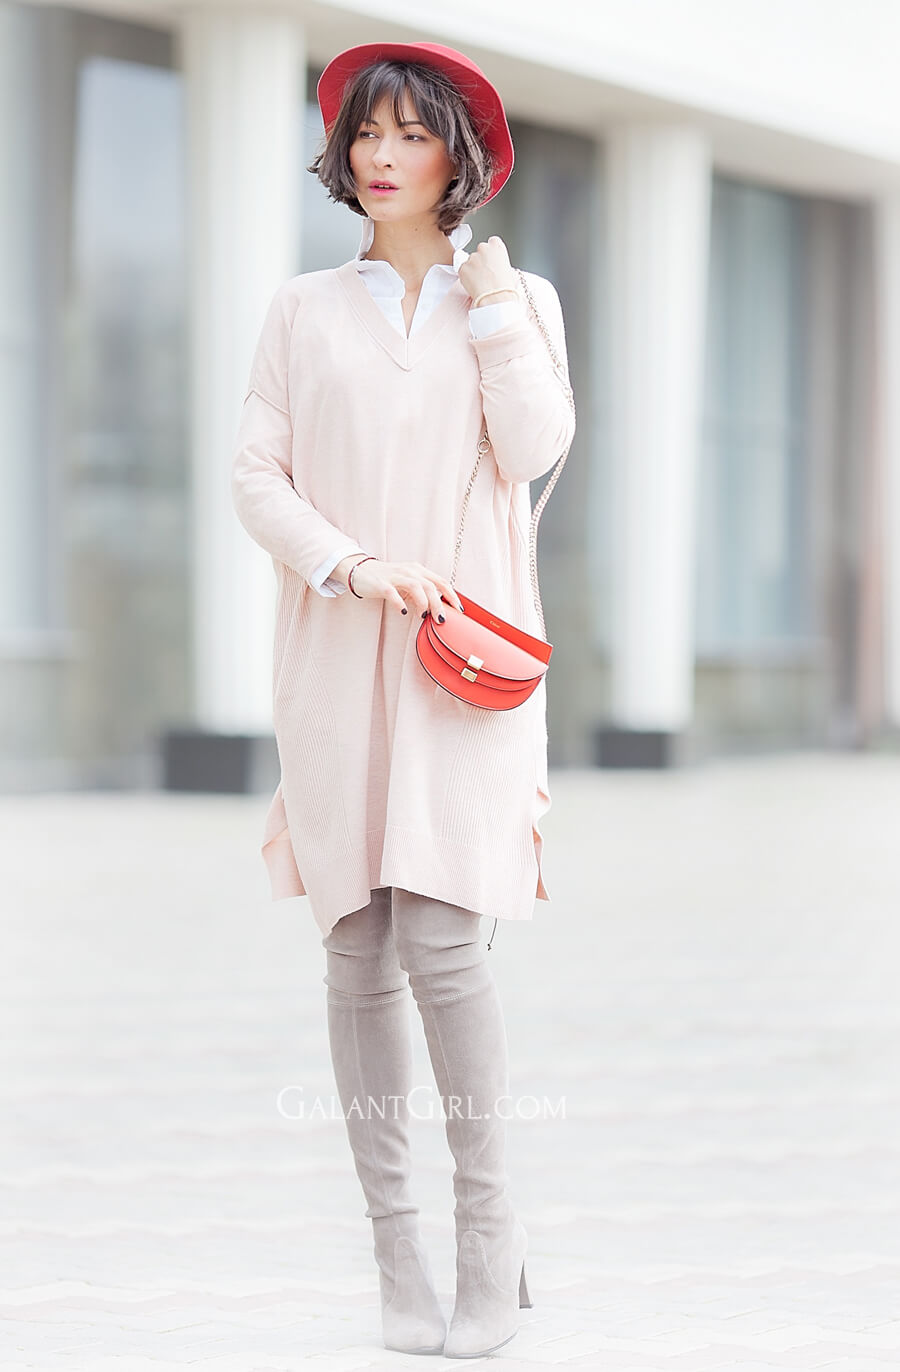 peach-white-asos-jumper-dress-street-style-ideas-for-spring-2016